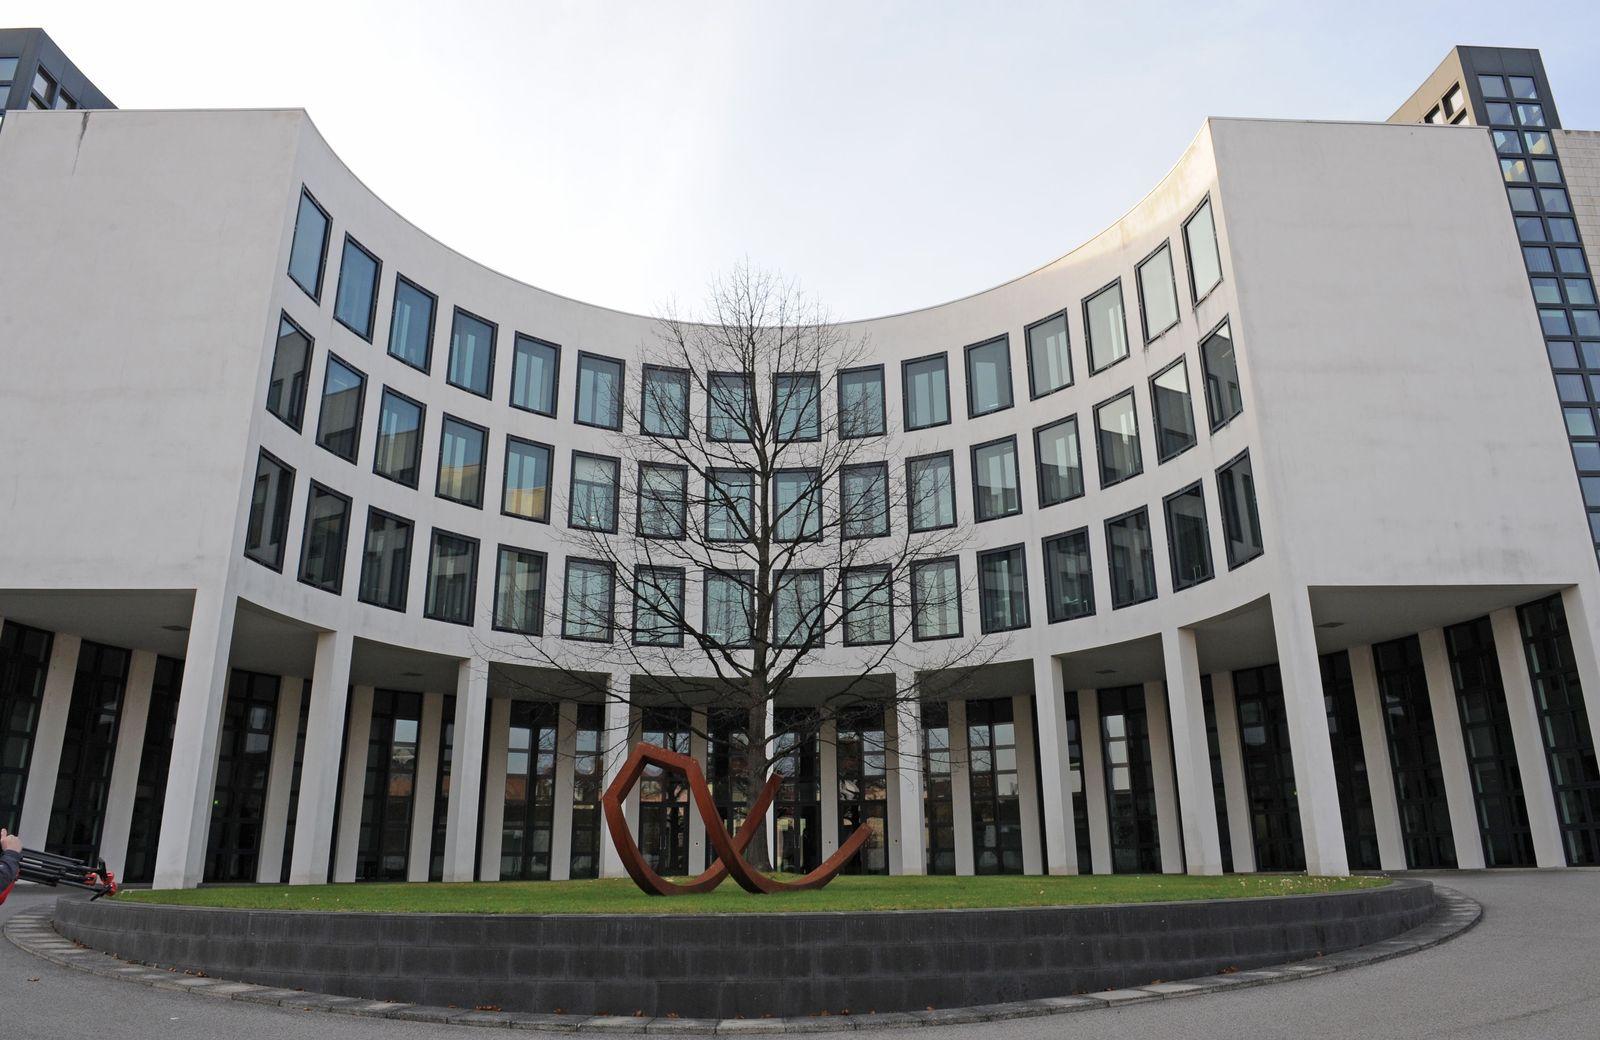 Generalbundesanwalt/ Chemnitz